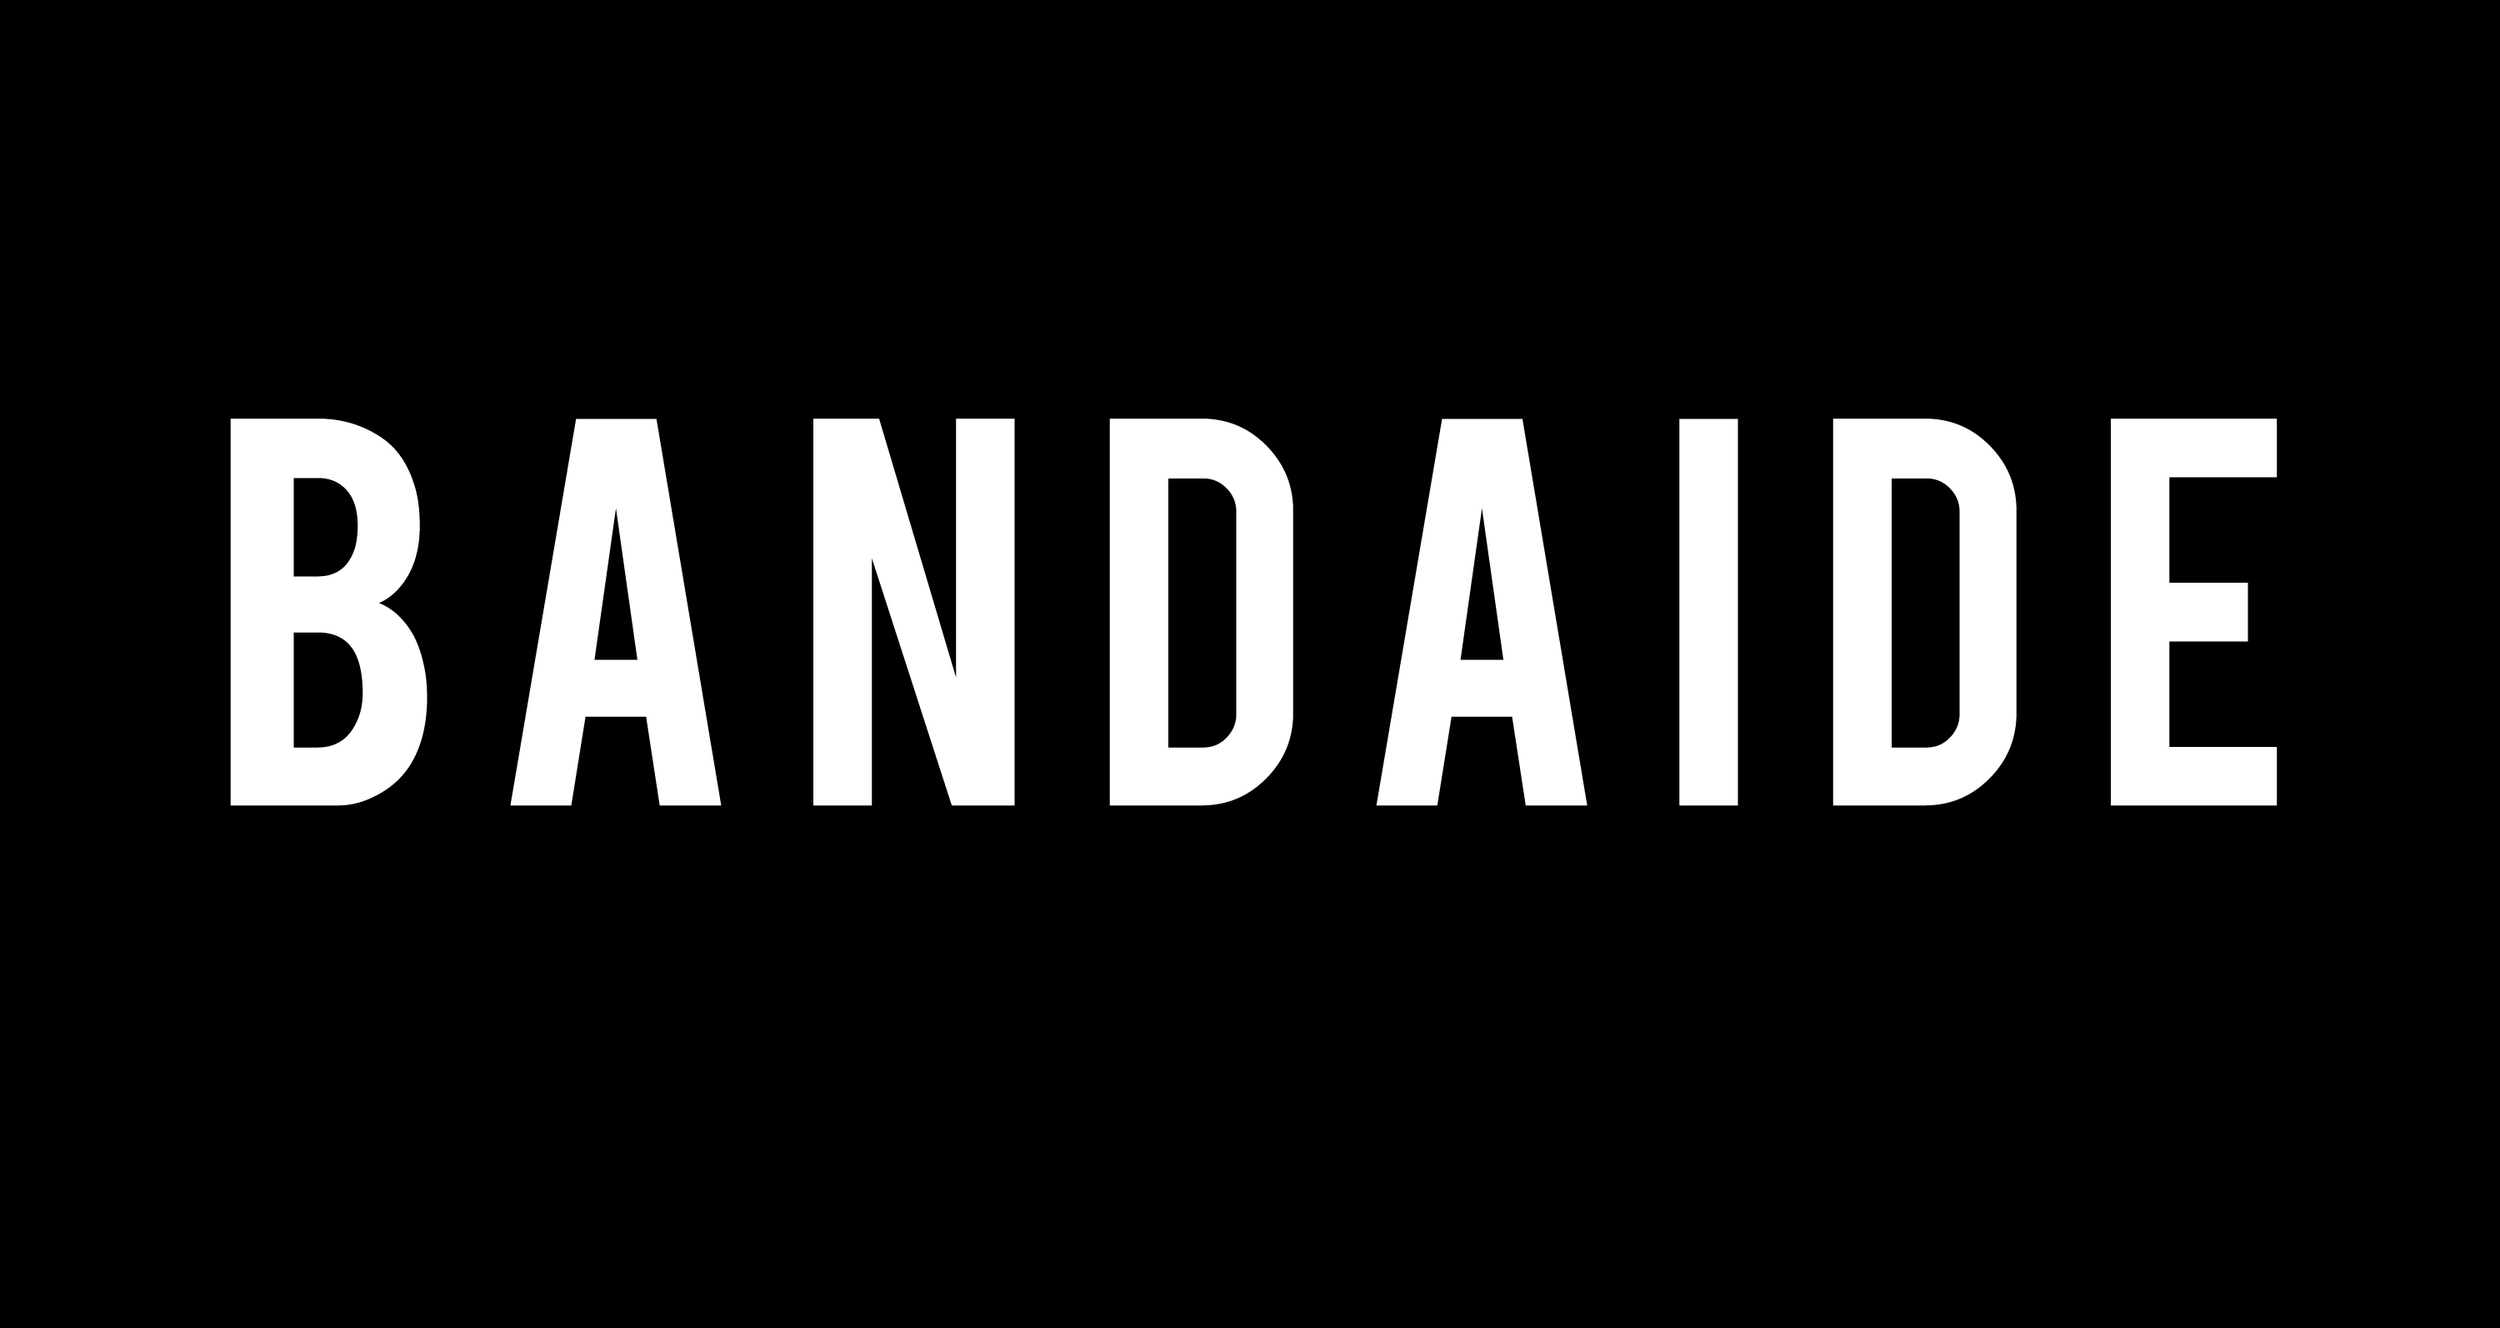 bandaide logo 4.jpg